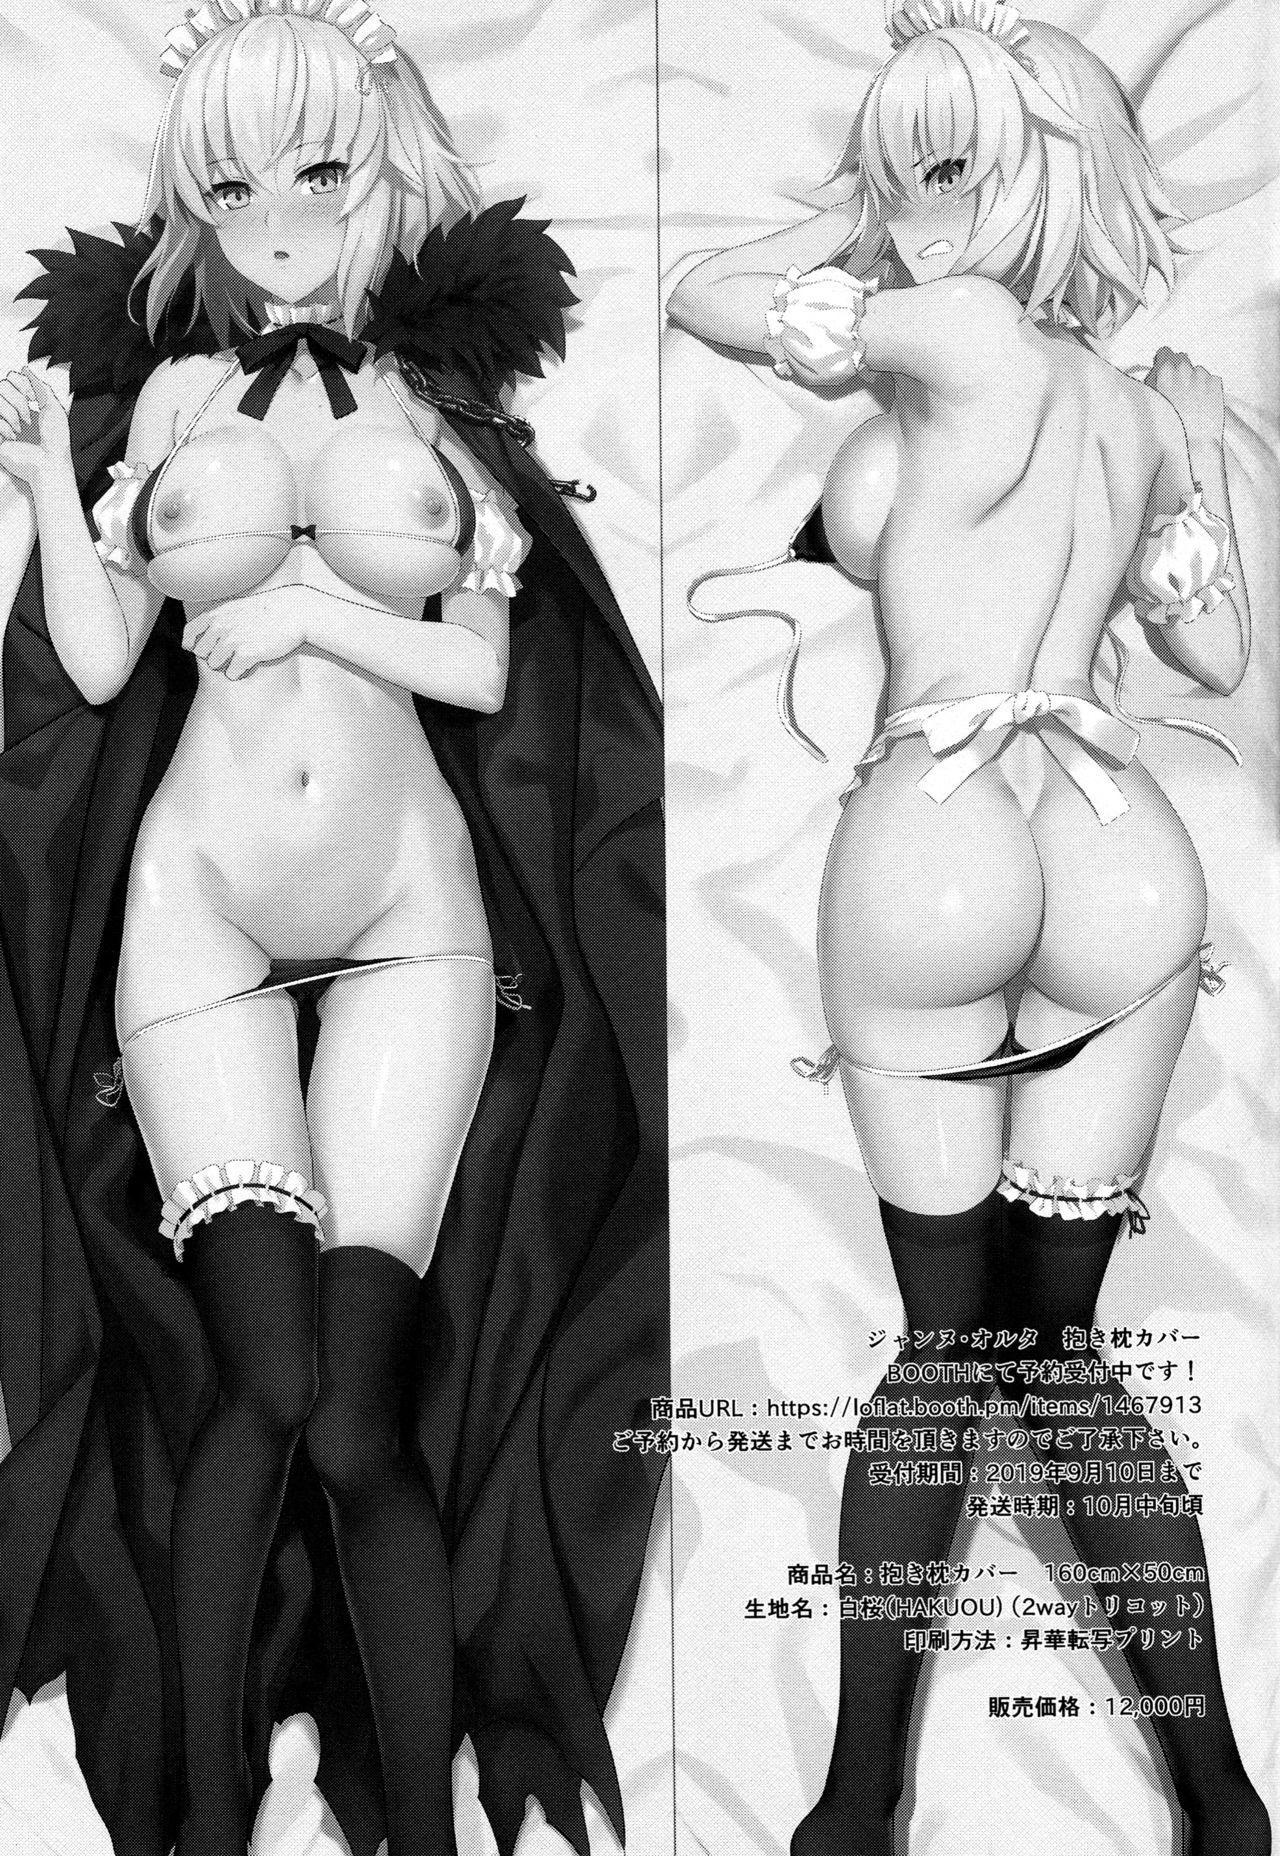 Chaldea Soap 2 Iinari Tsundere Gohoushi Maid 17